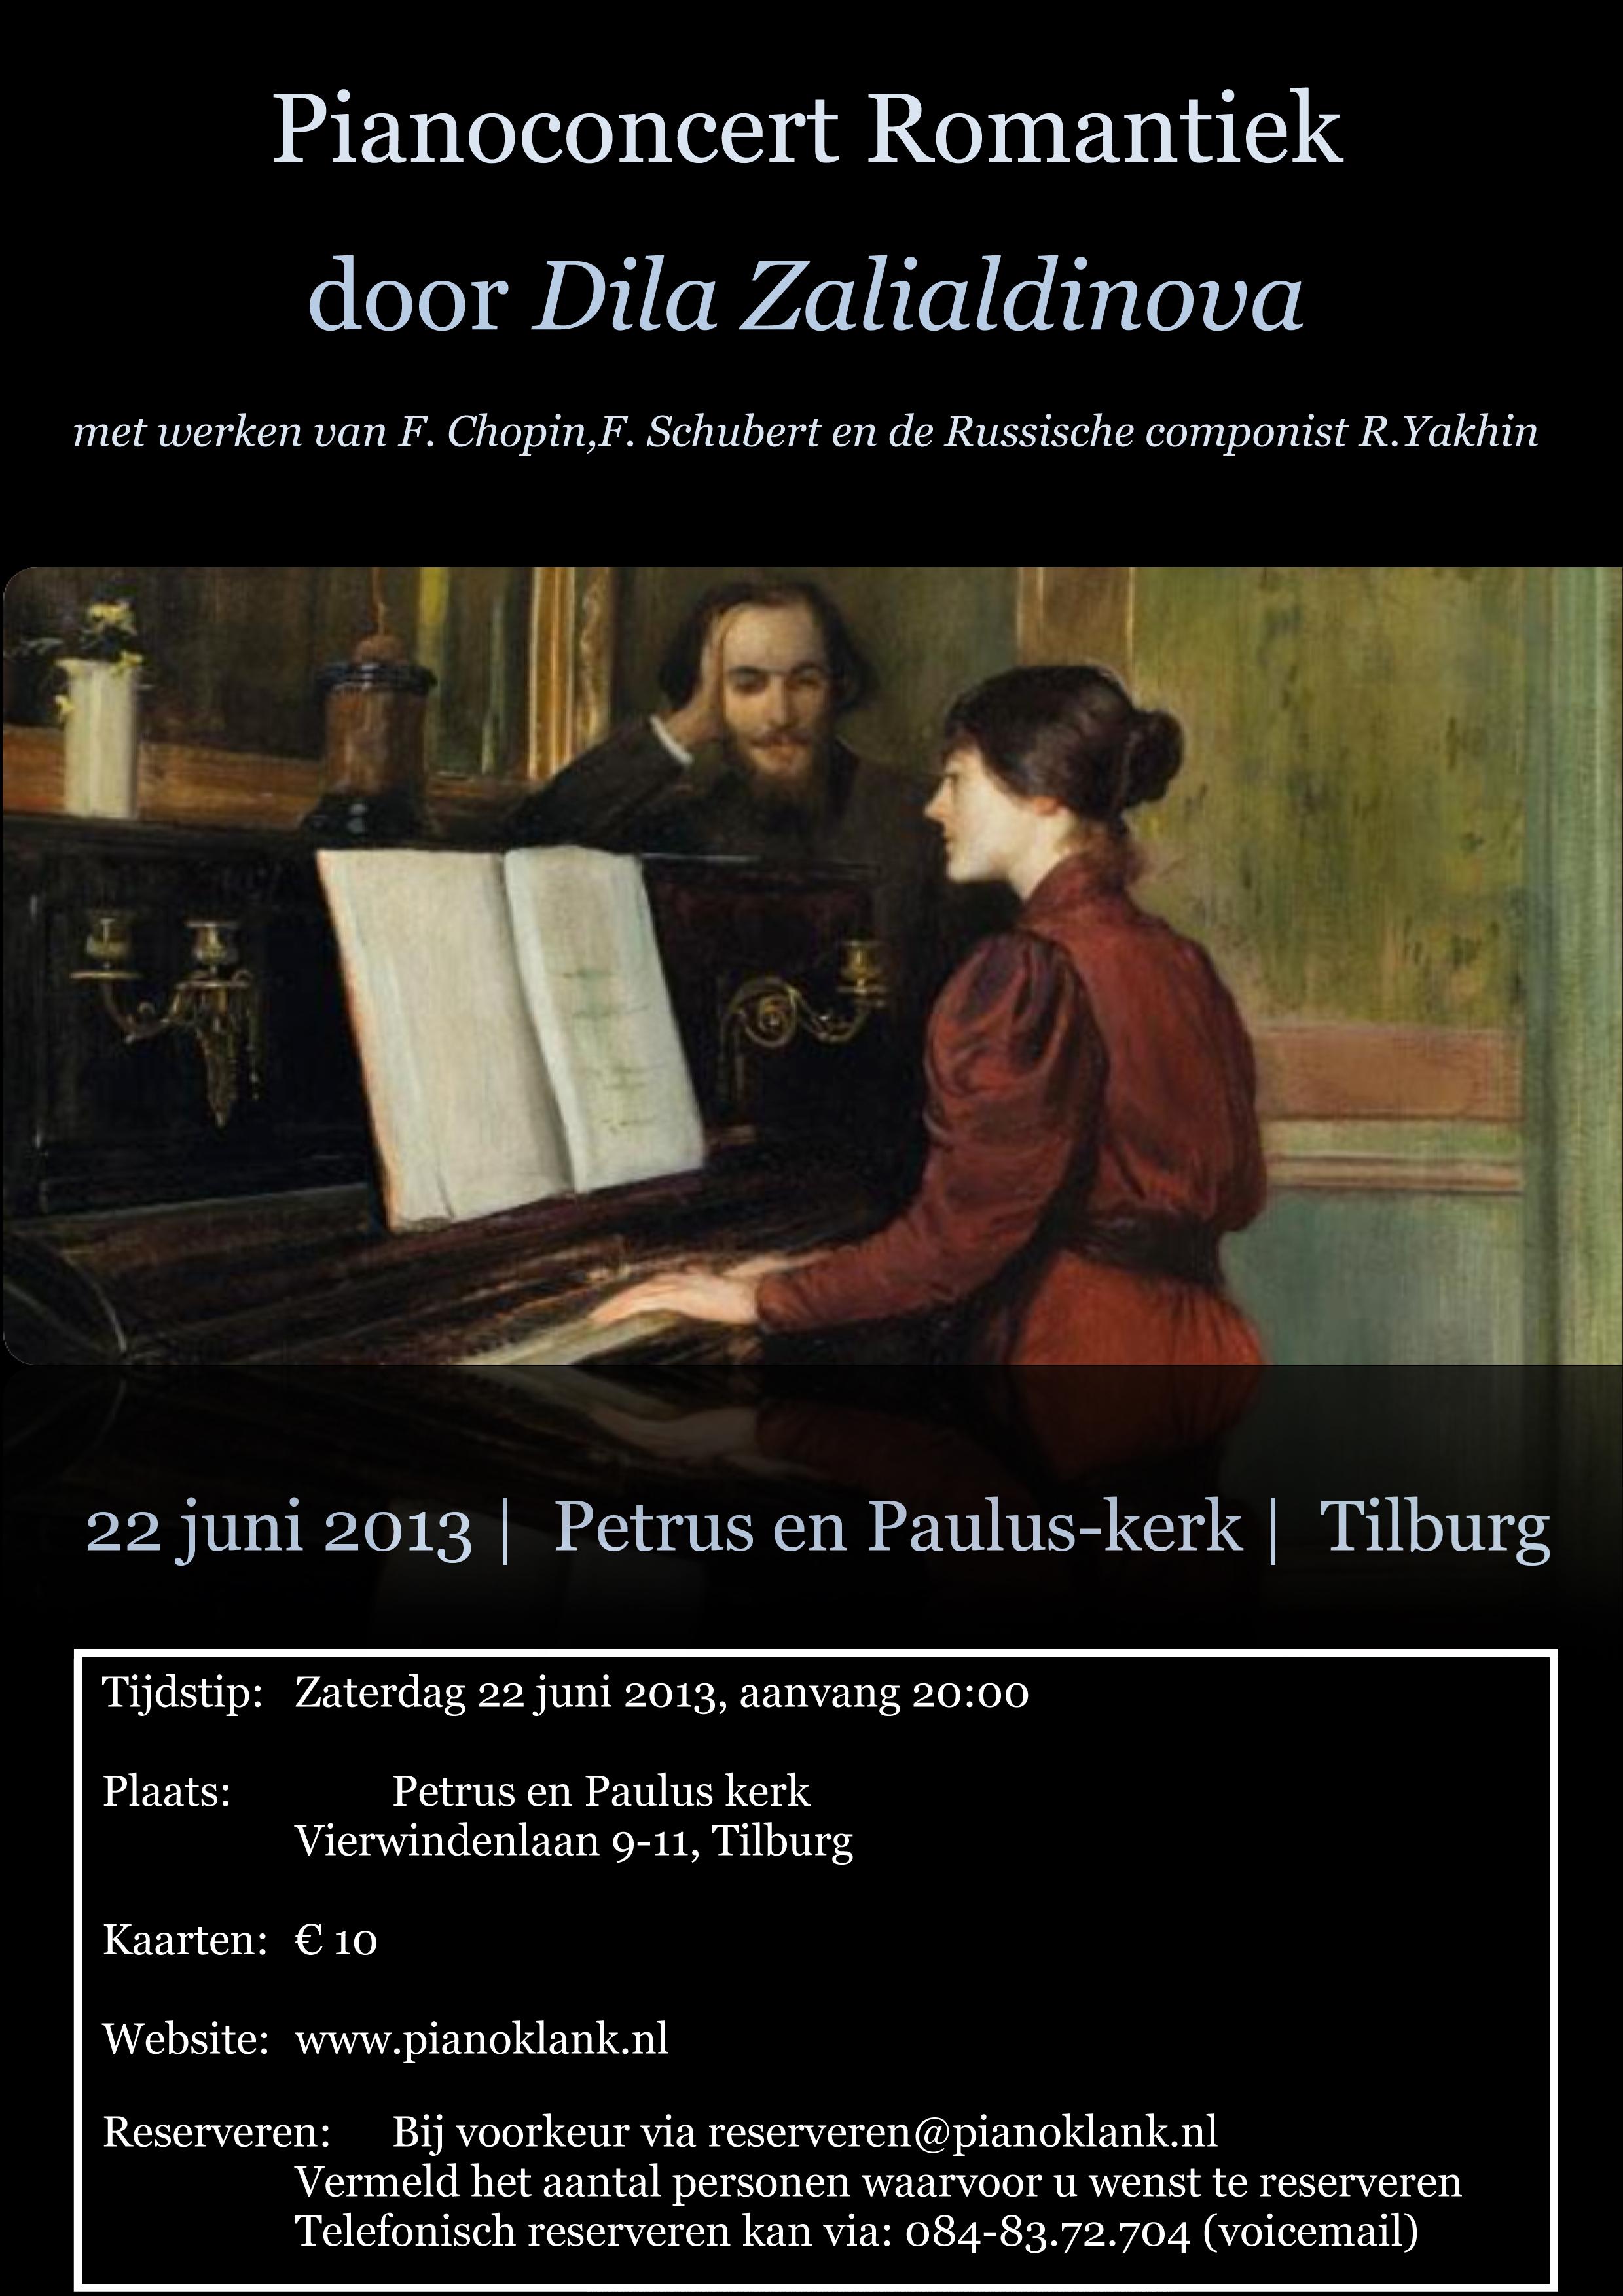 Affiche Pianoconcert Romantiek 3_Dila Zalialdinova